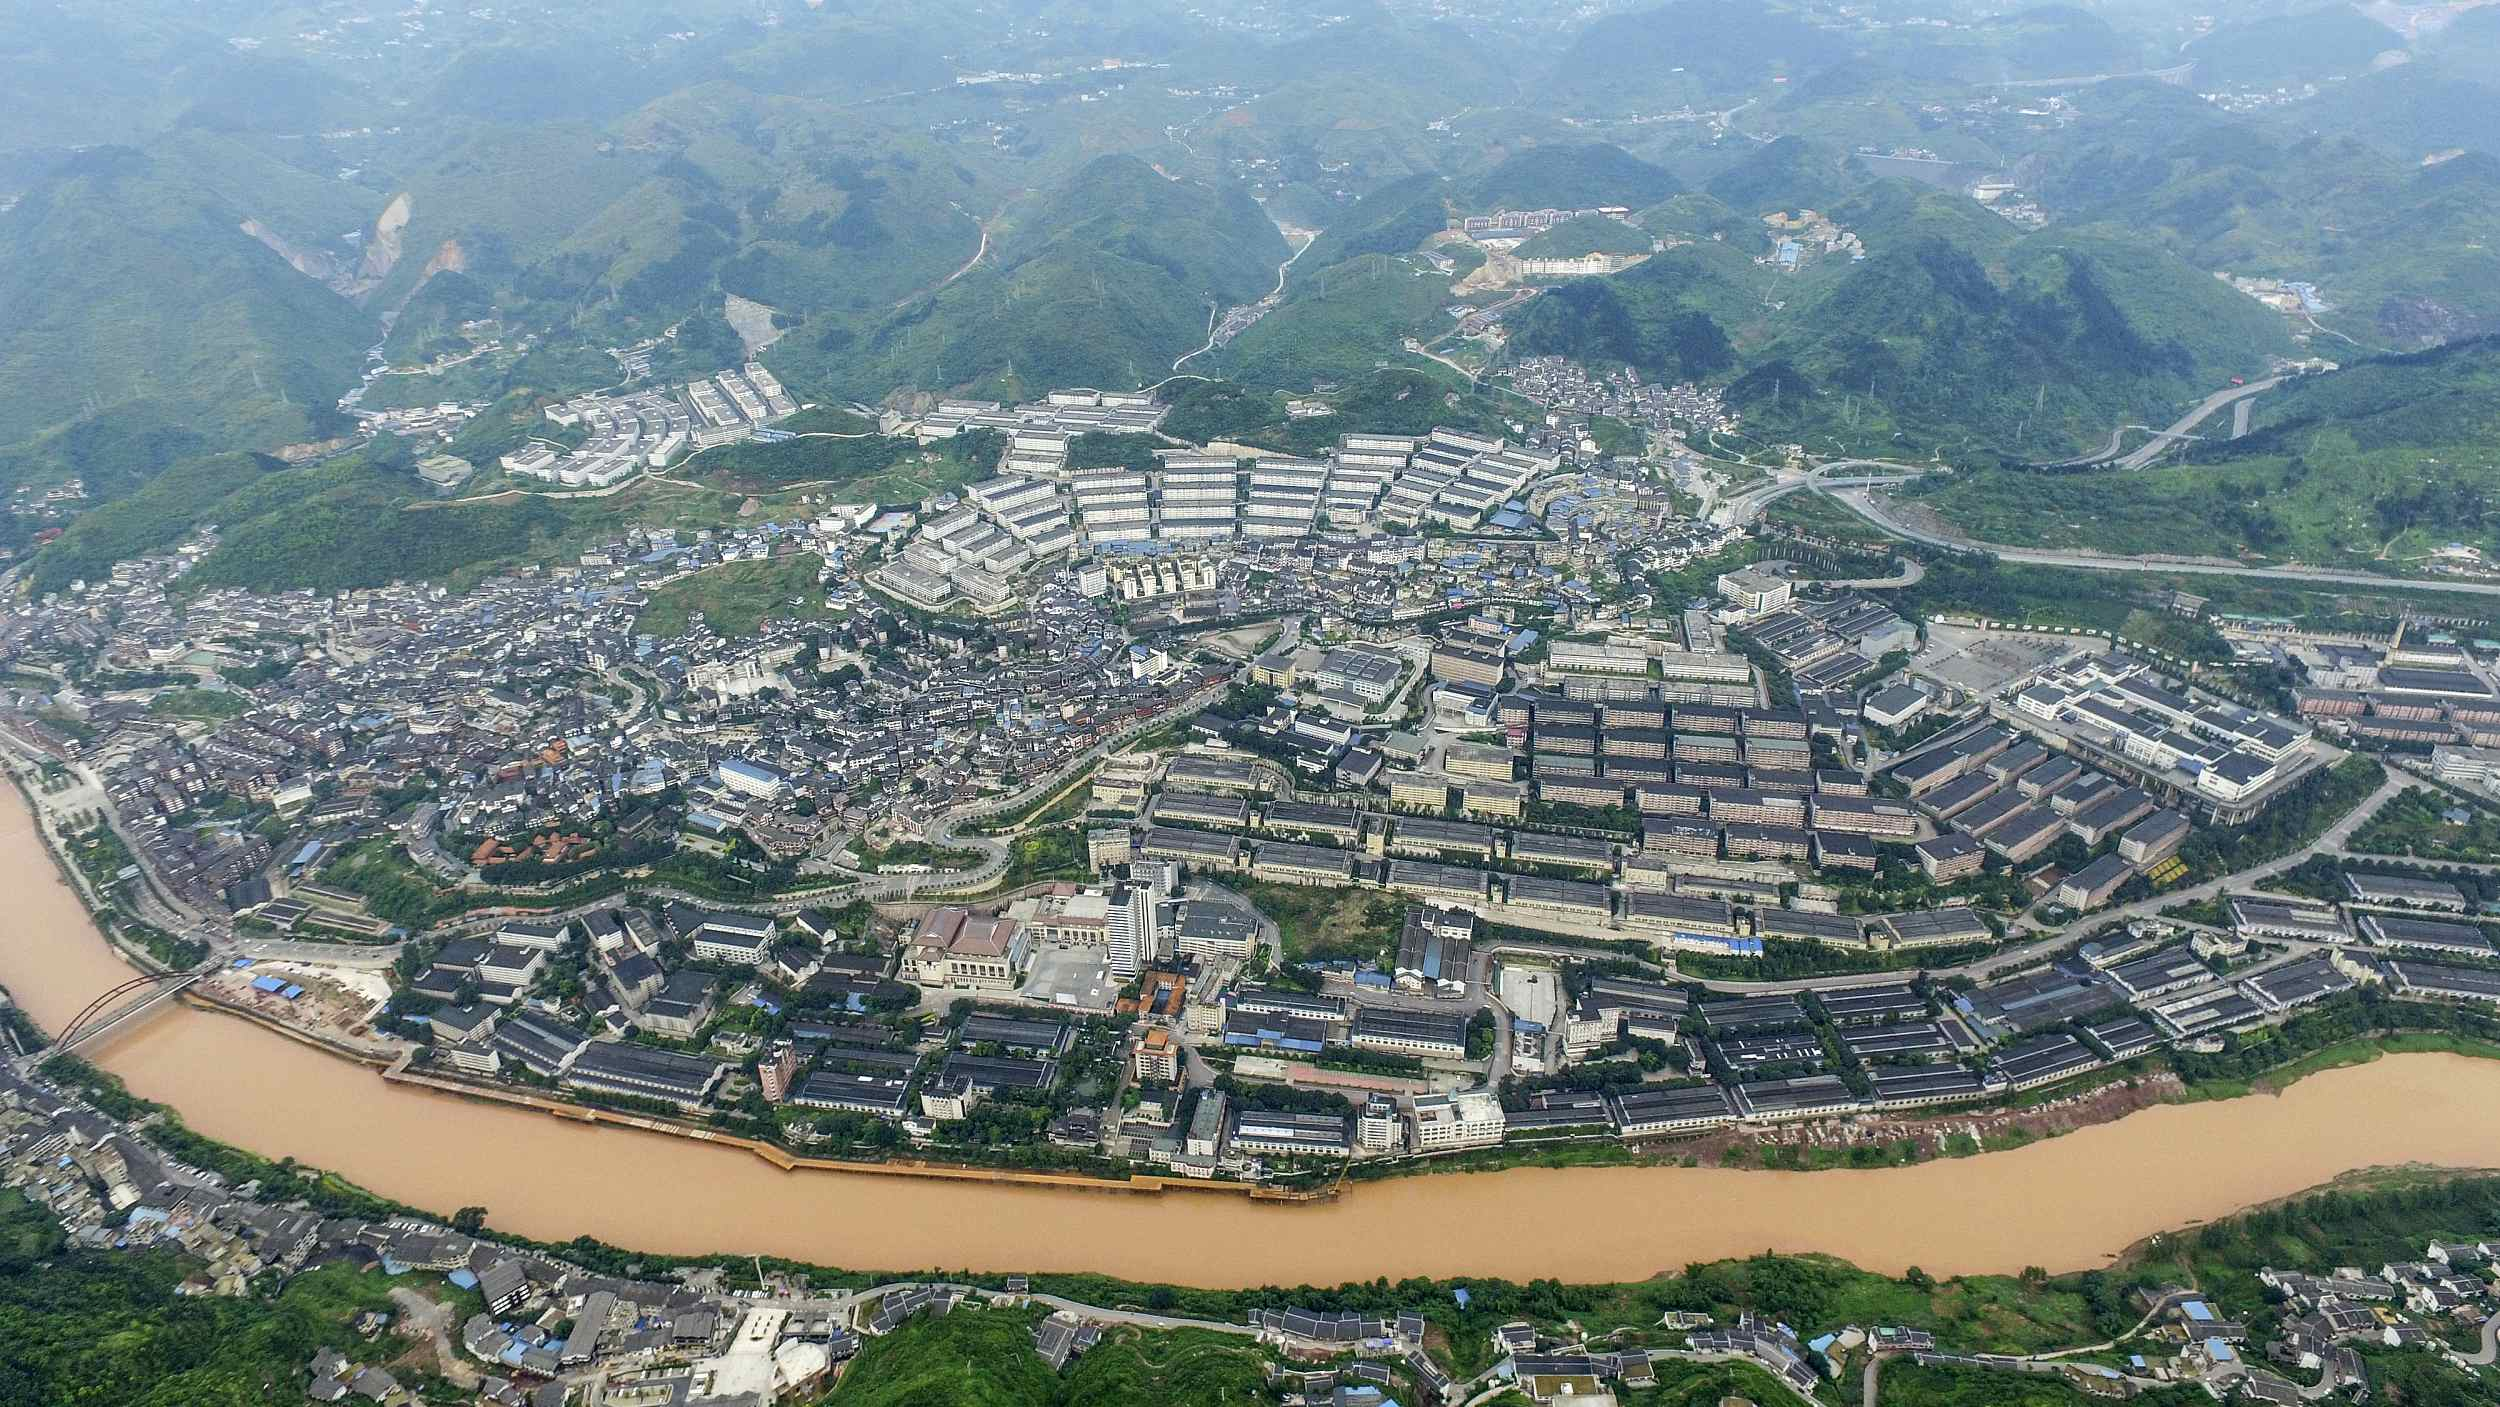 Chishui River – Myth and life of Moutai baijiu